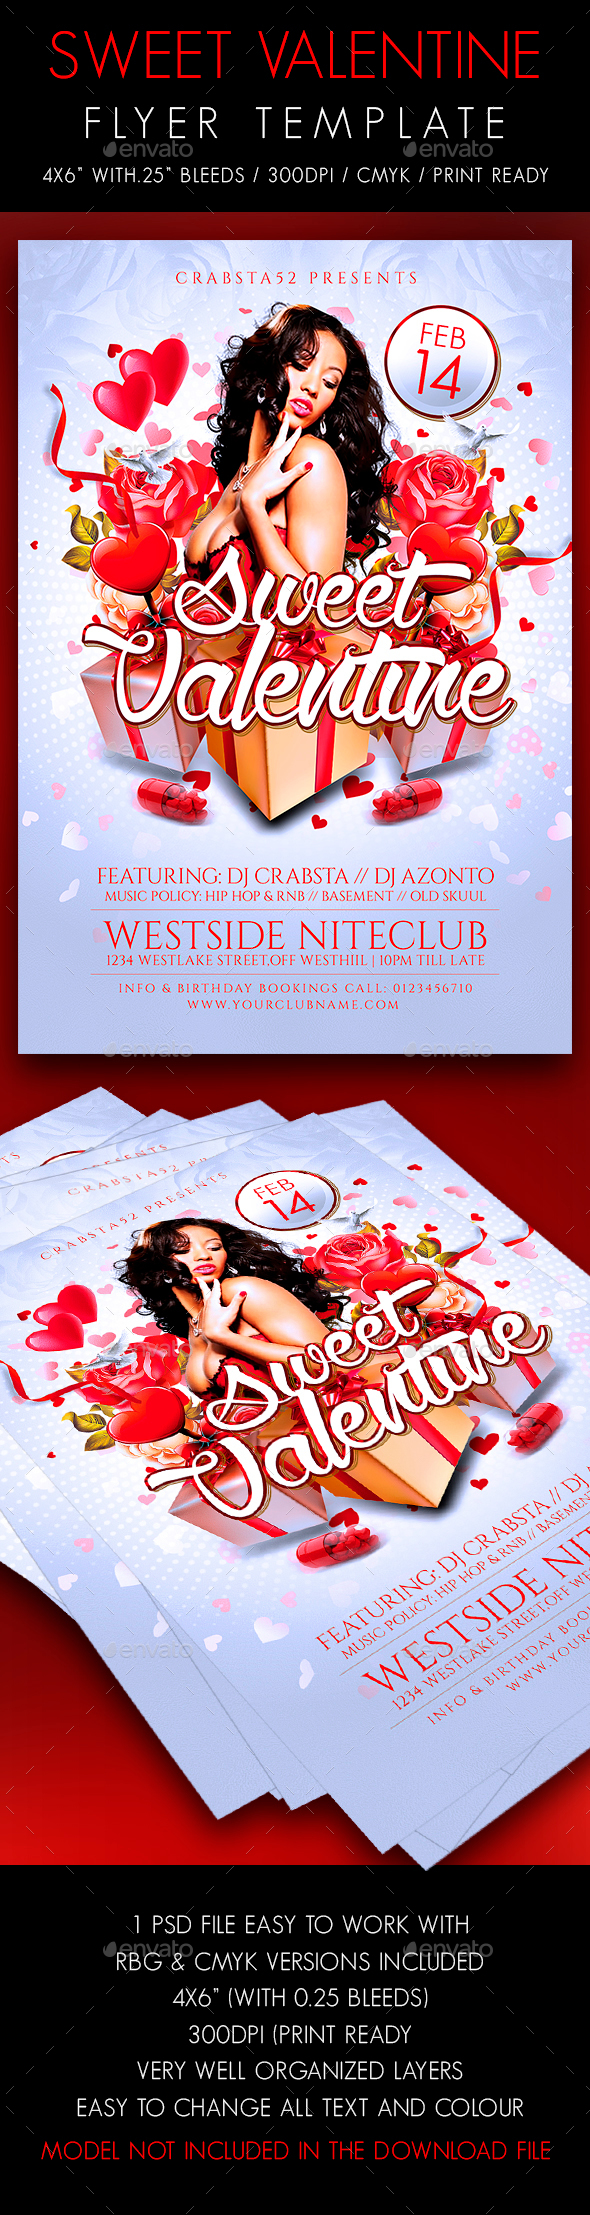 Sweet Valentine Flyer Template